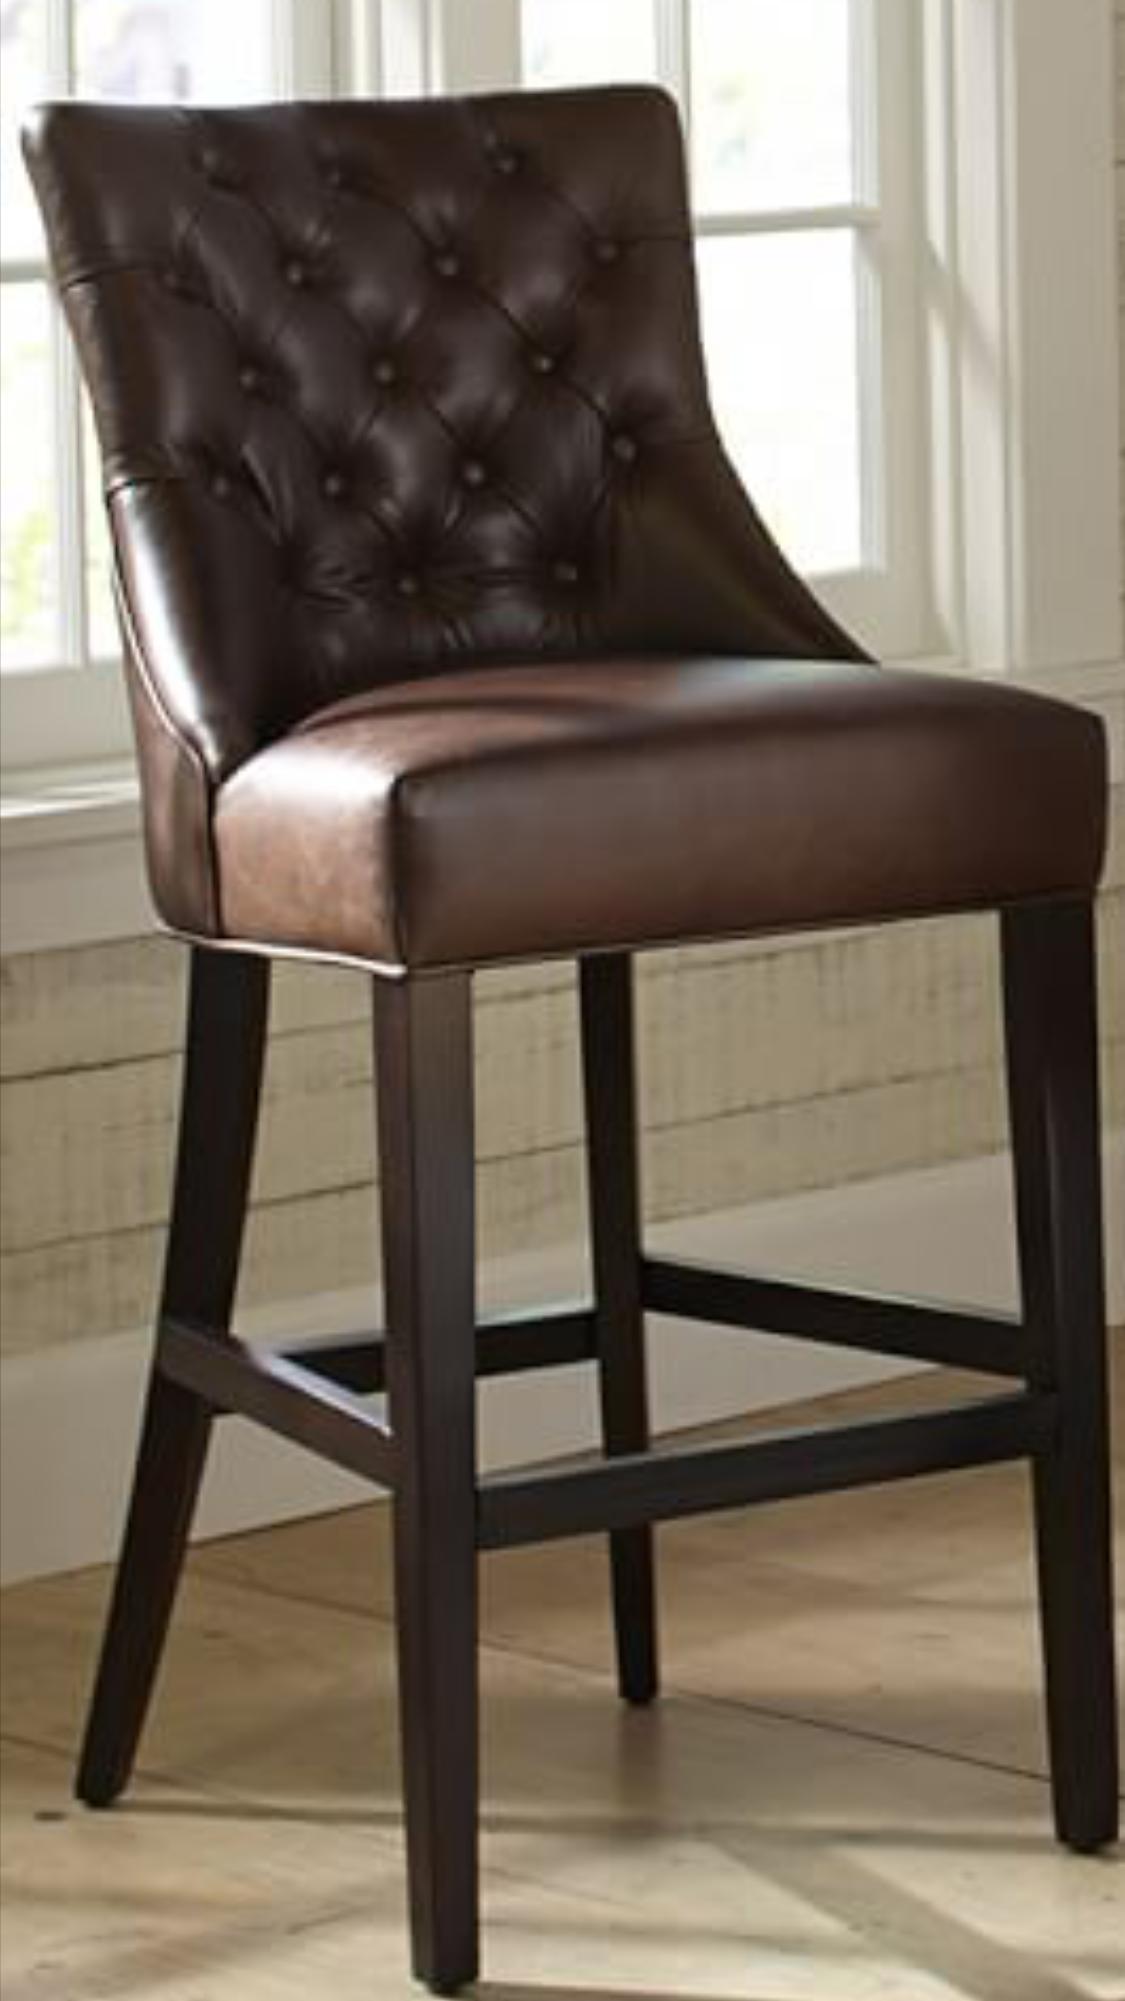 Strange Tufted Leather Kitchen Bar Stool Idea 4 House Beatyapartments Chair Design Images Beatyapartmentscom